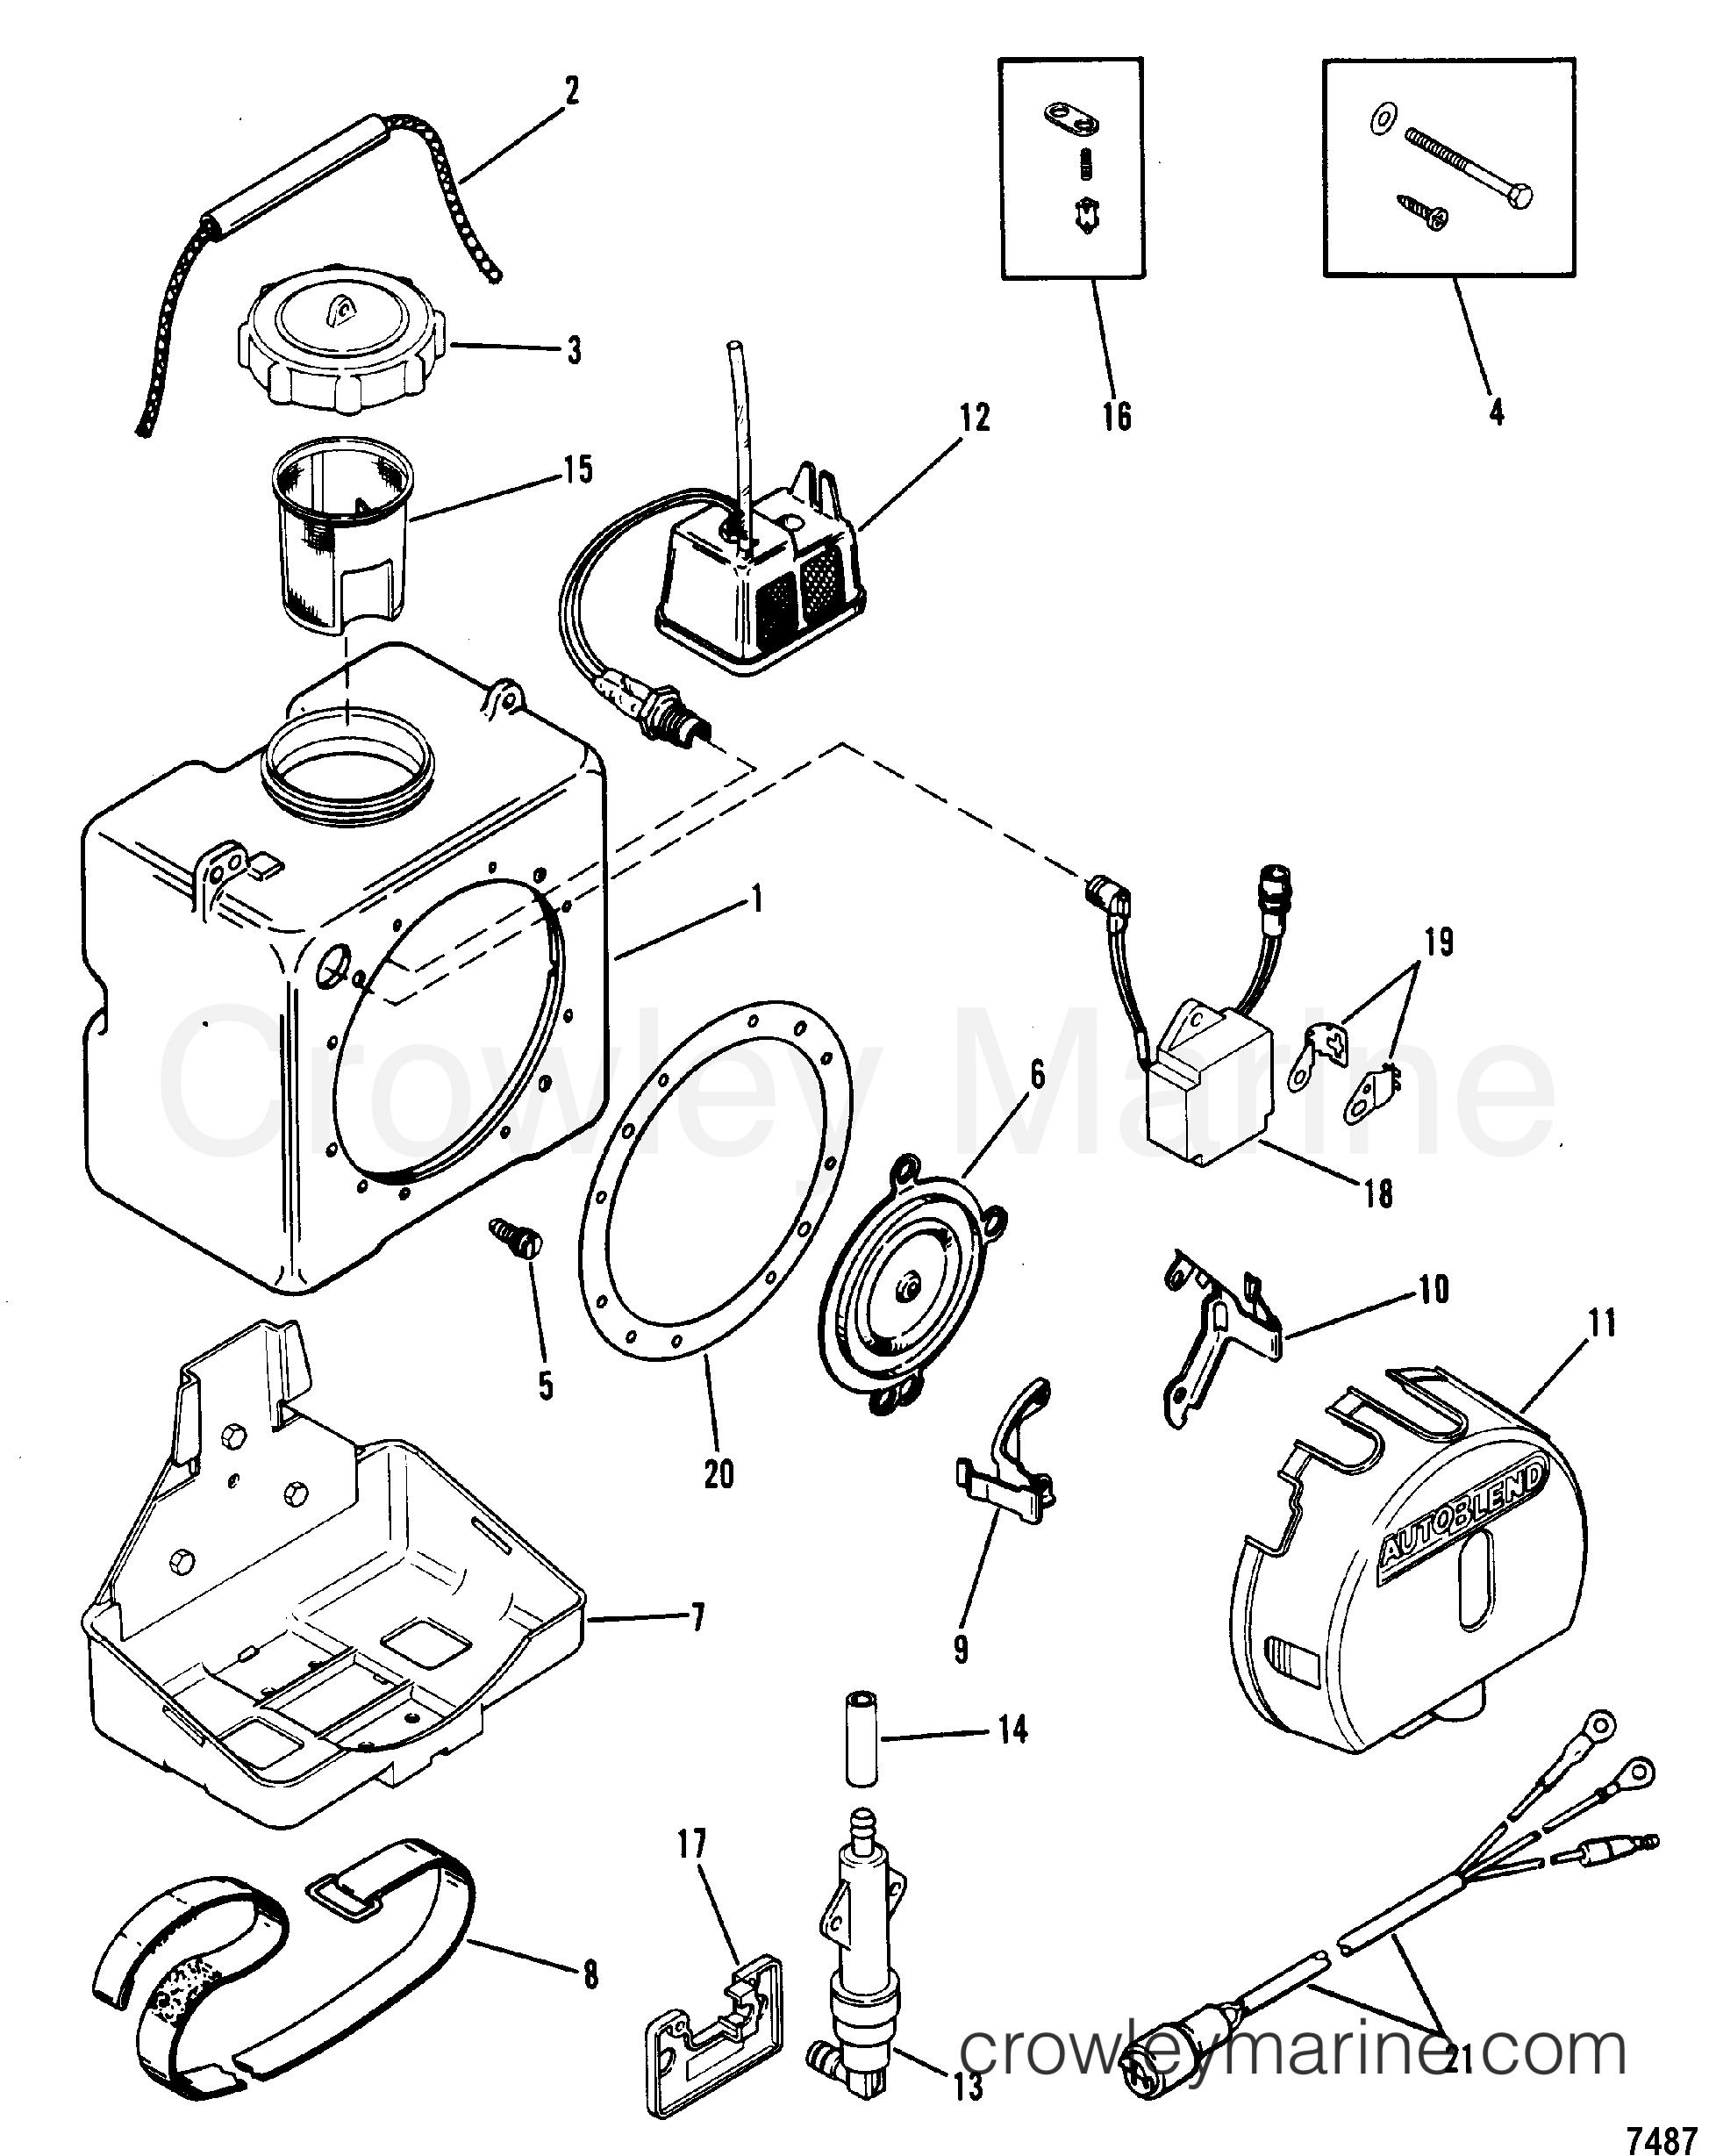 auto-blend